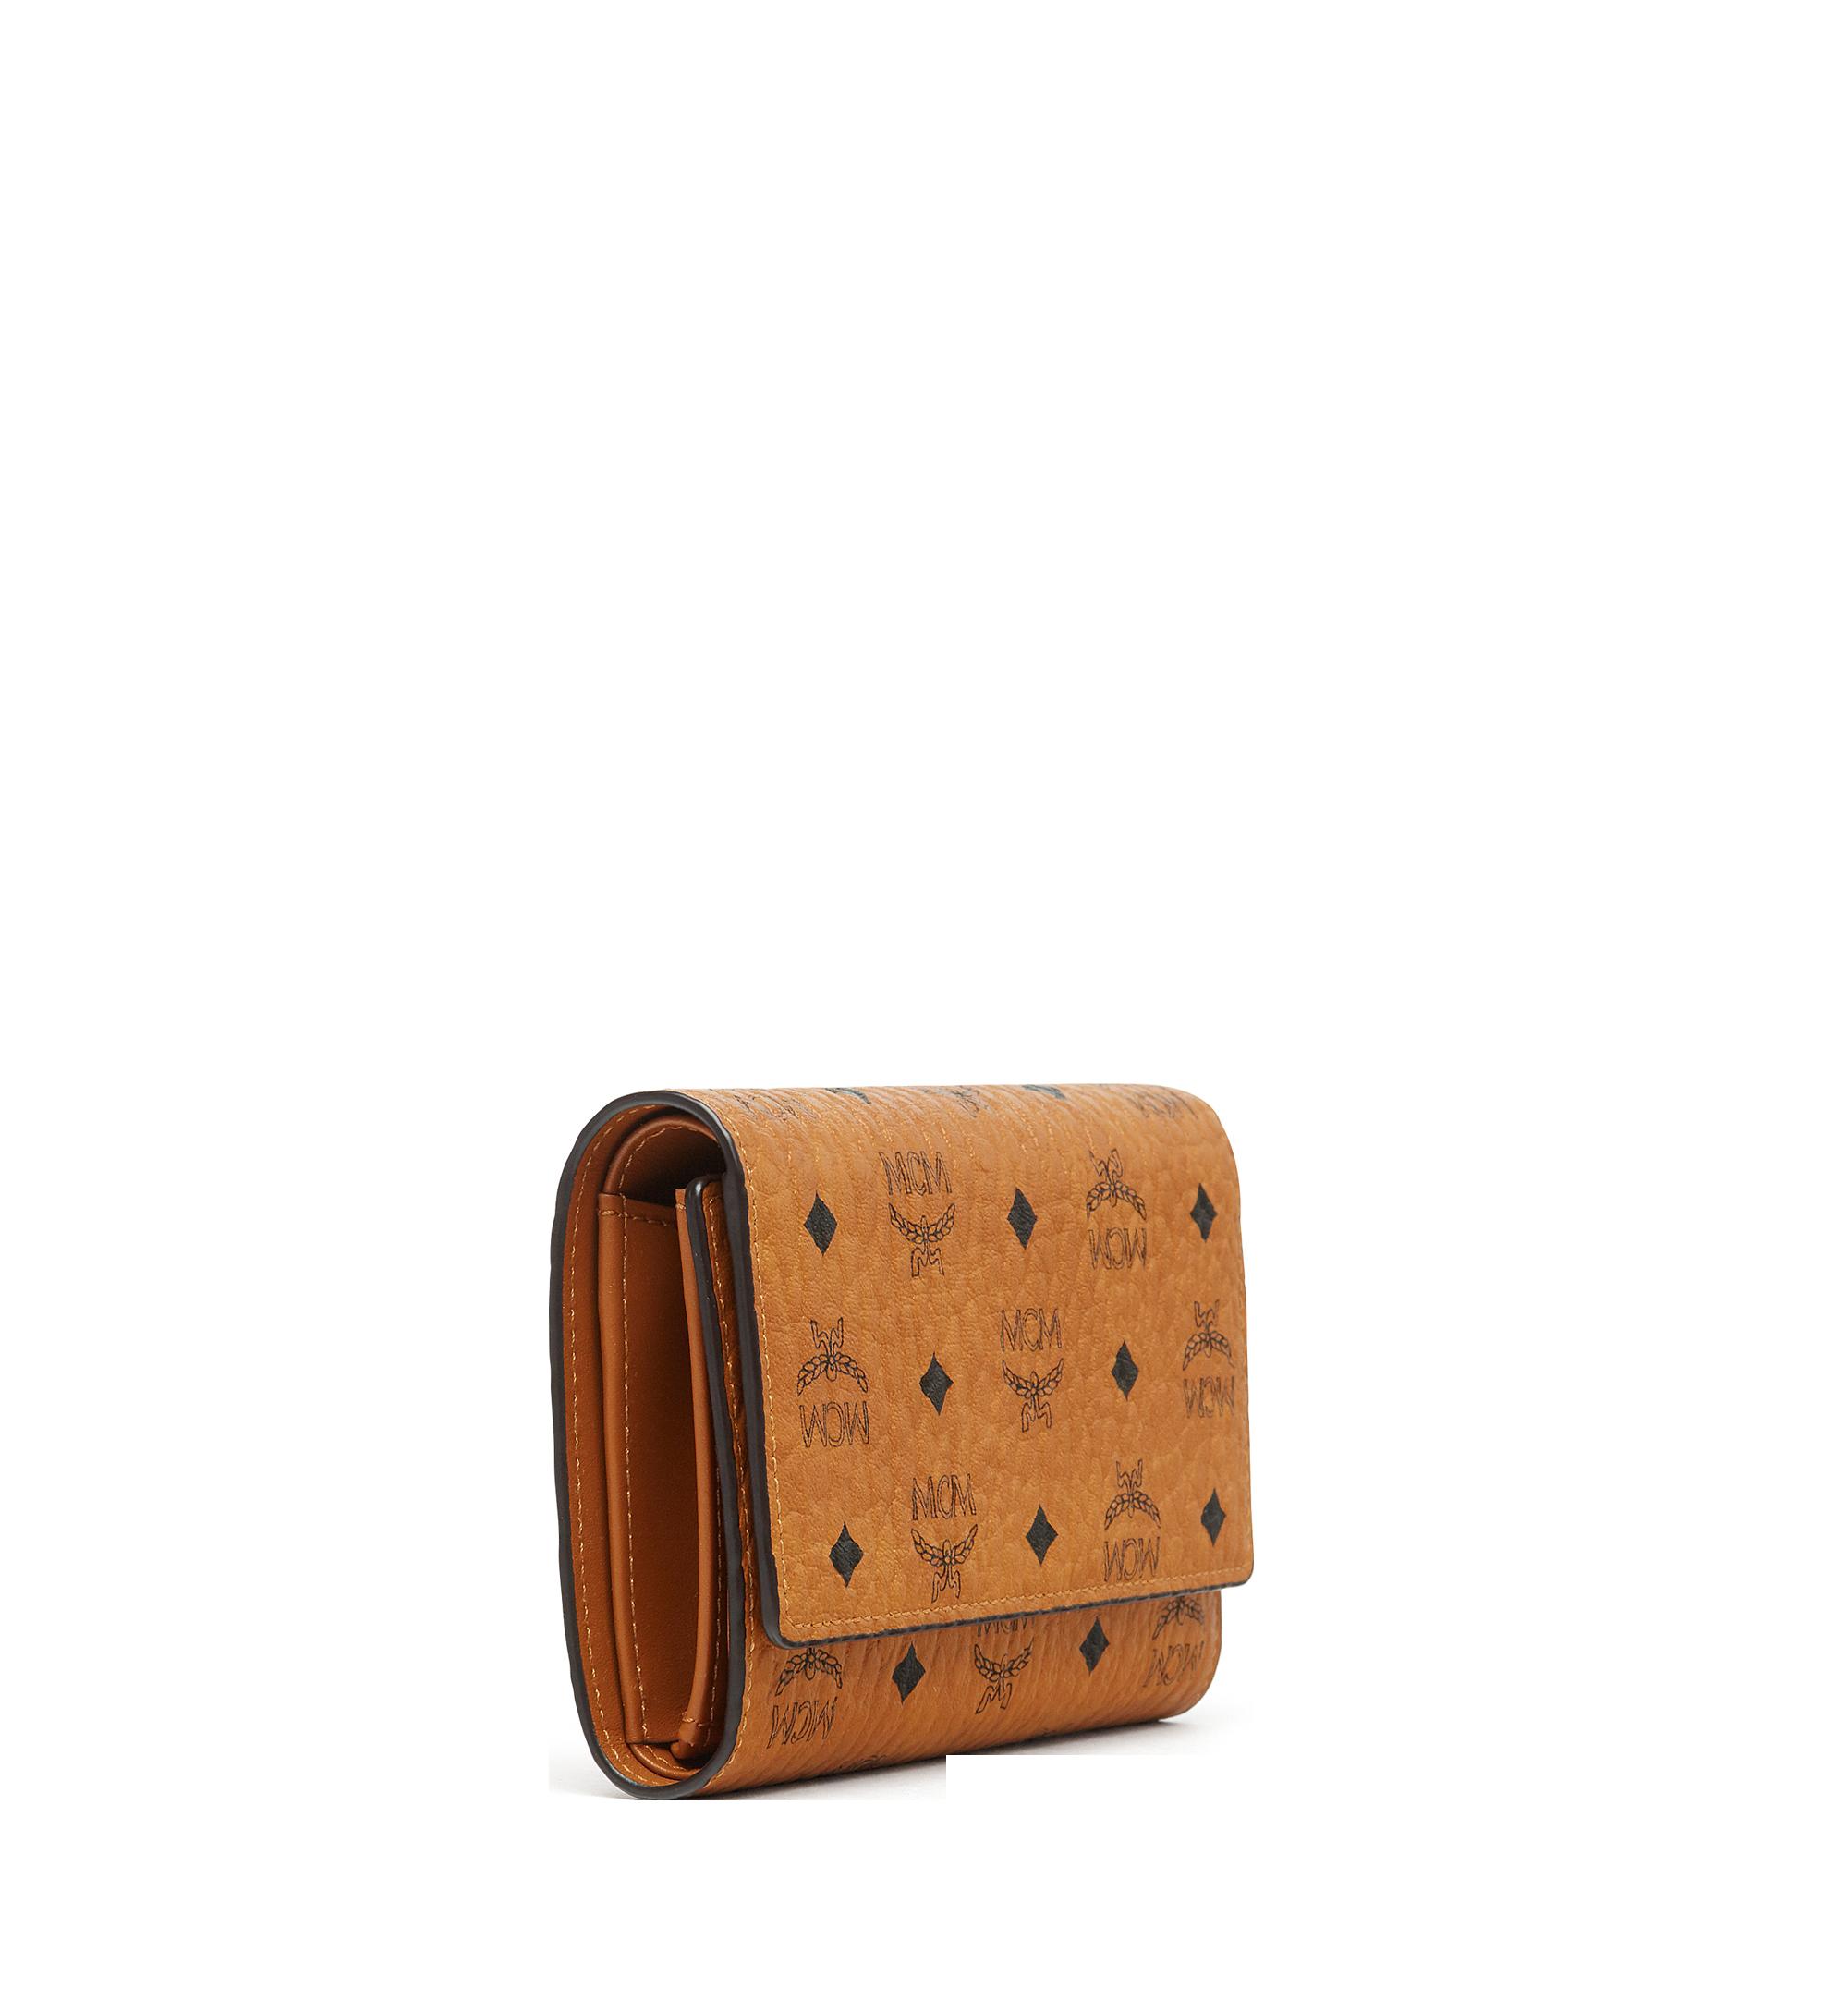 MCM Trifold Wallet in Visetos Original Cognac MYMAAVI01CO001 Alternate View 1